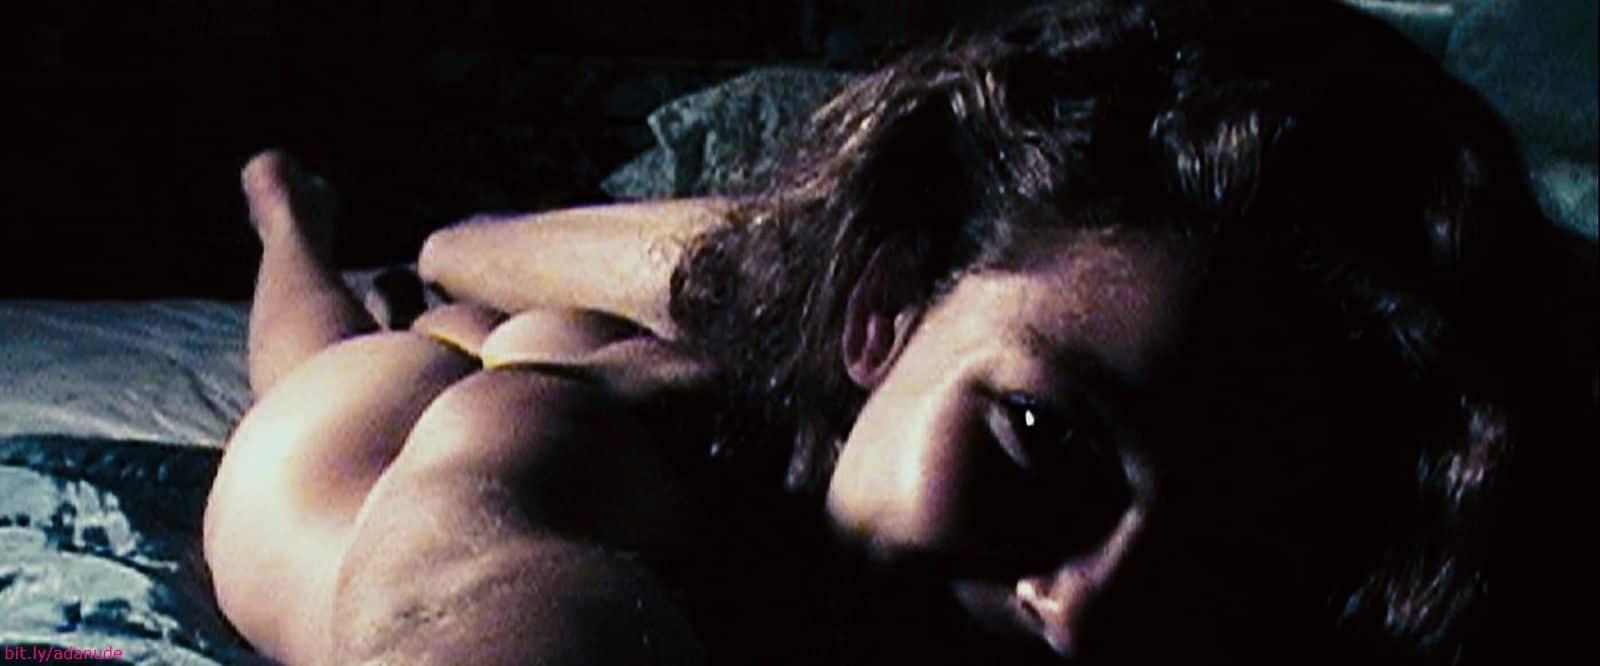 Hairy naked voluptuous women